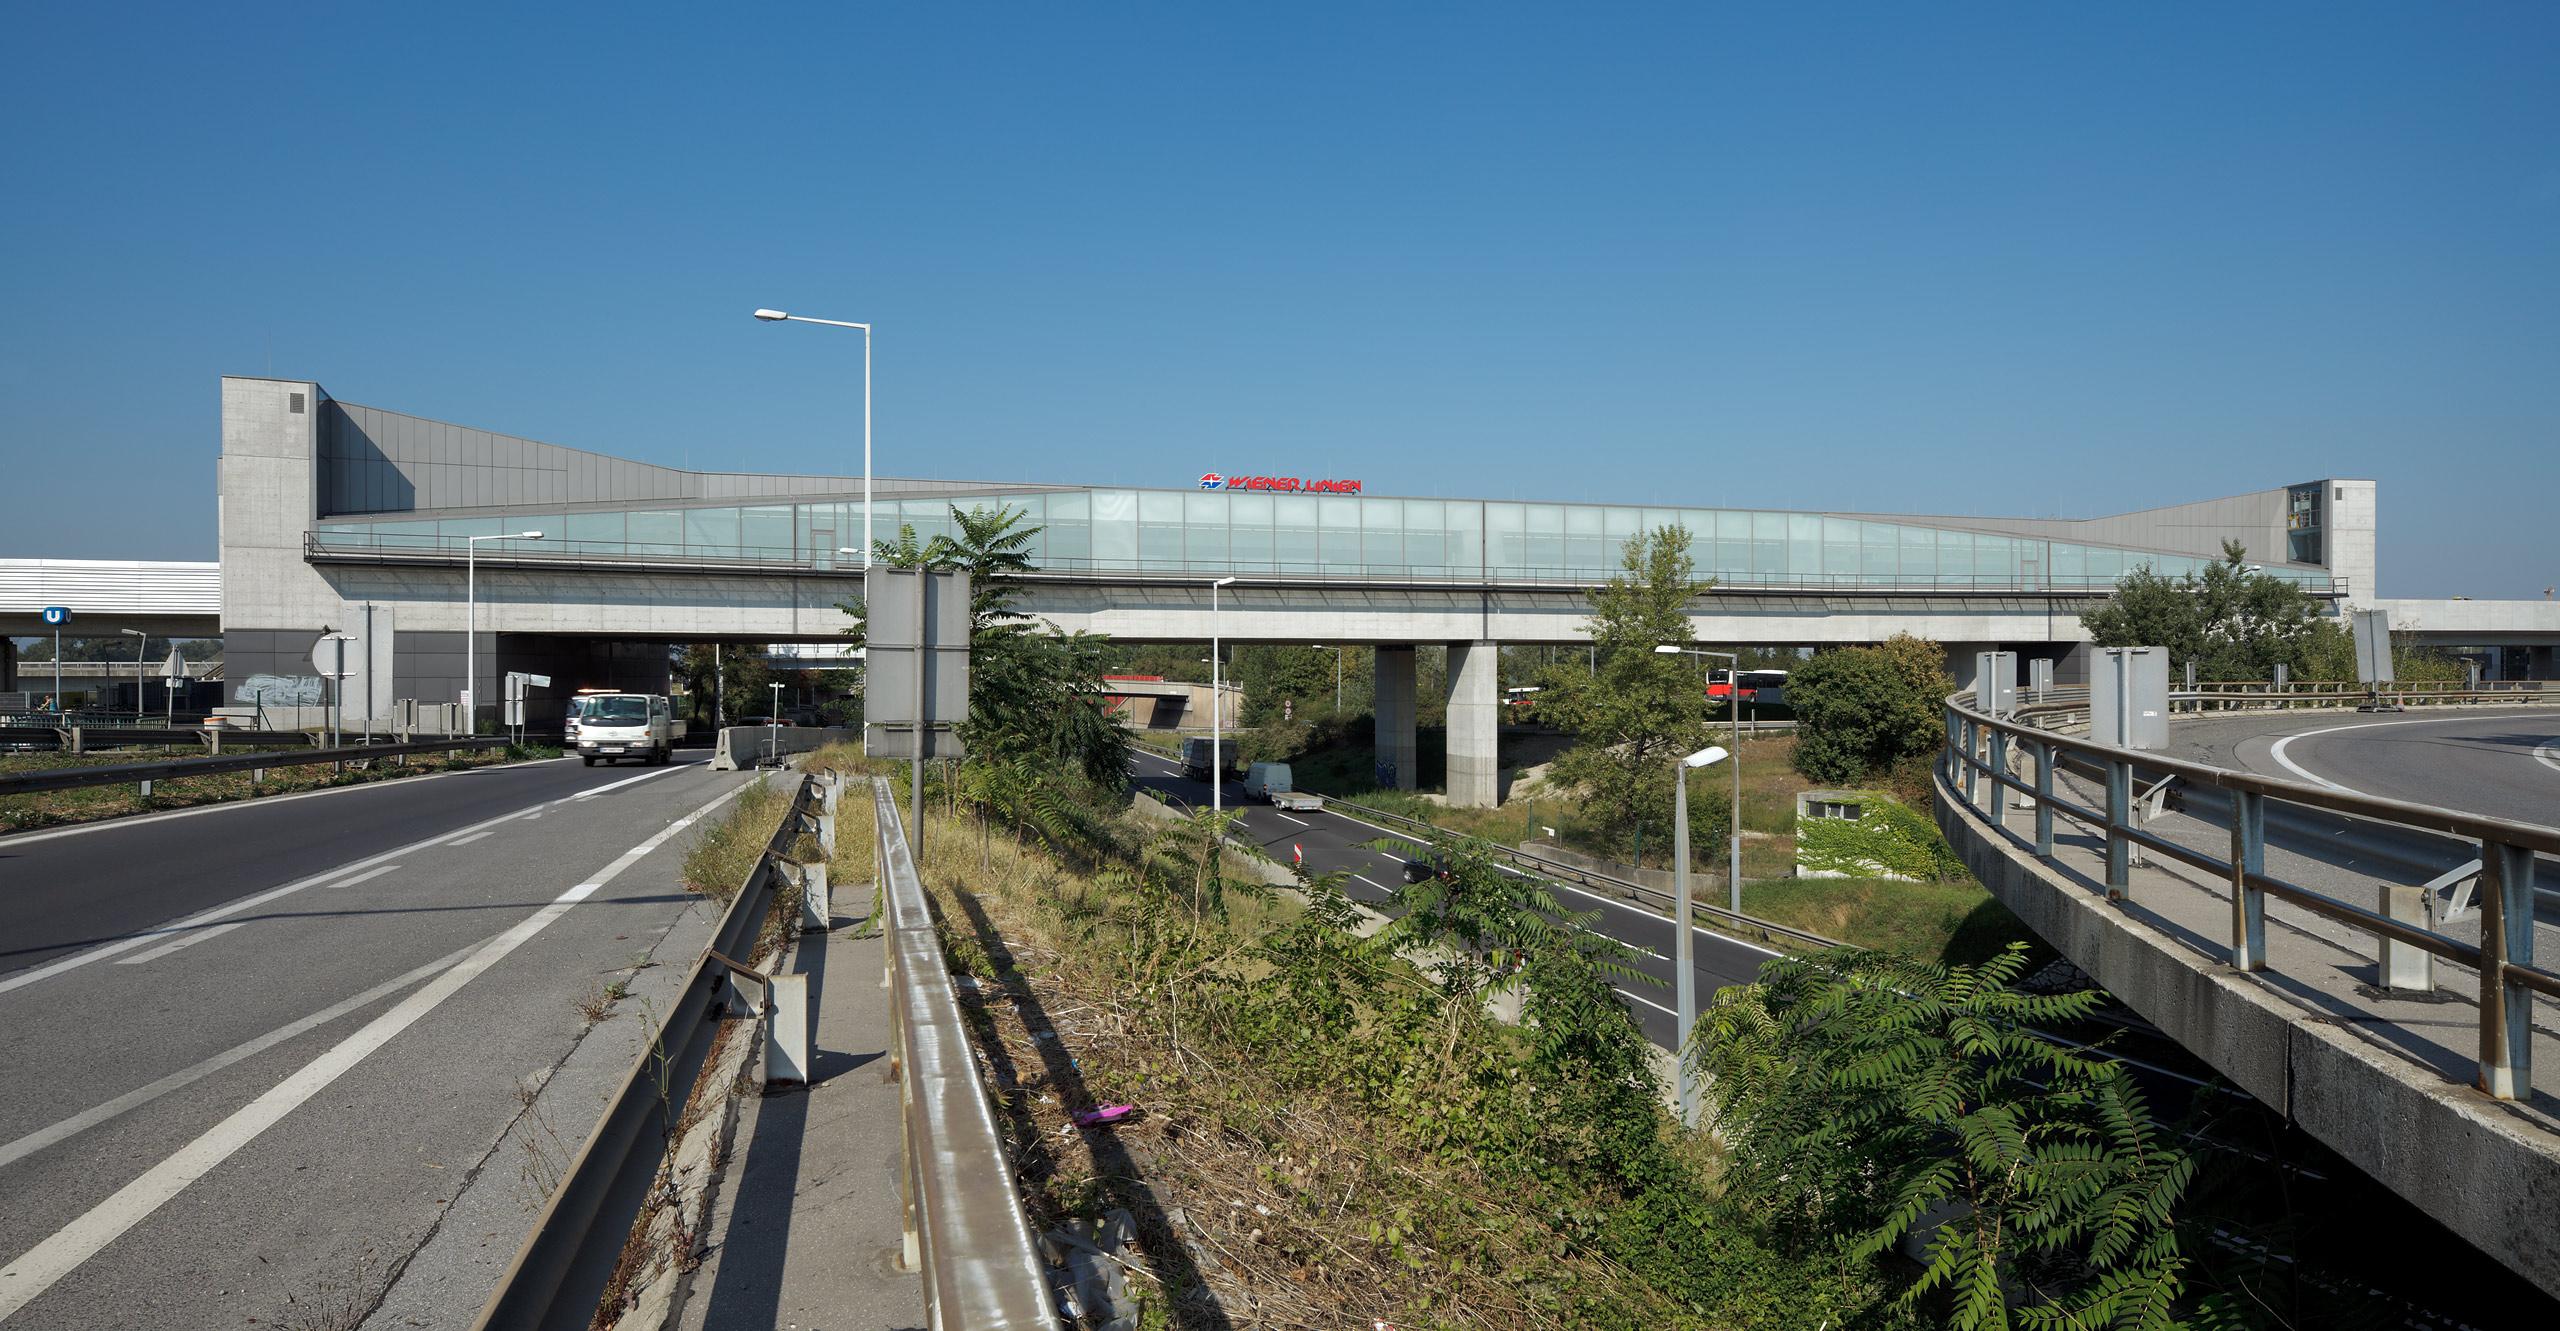 U2 Underground  Station Donaustadtbrücke